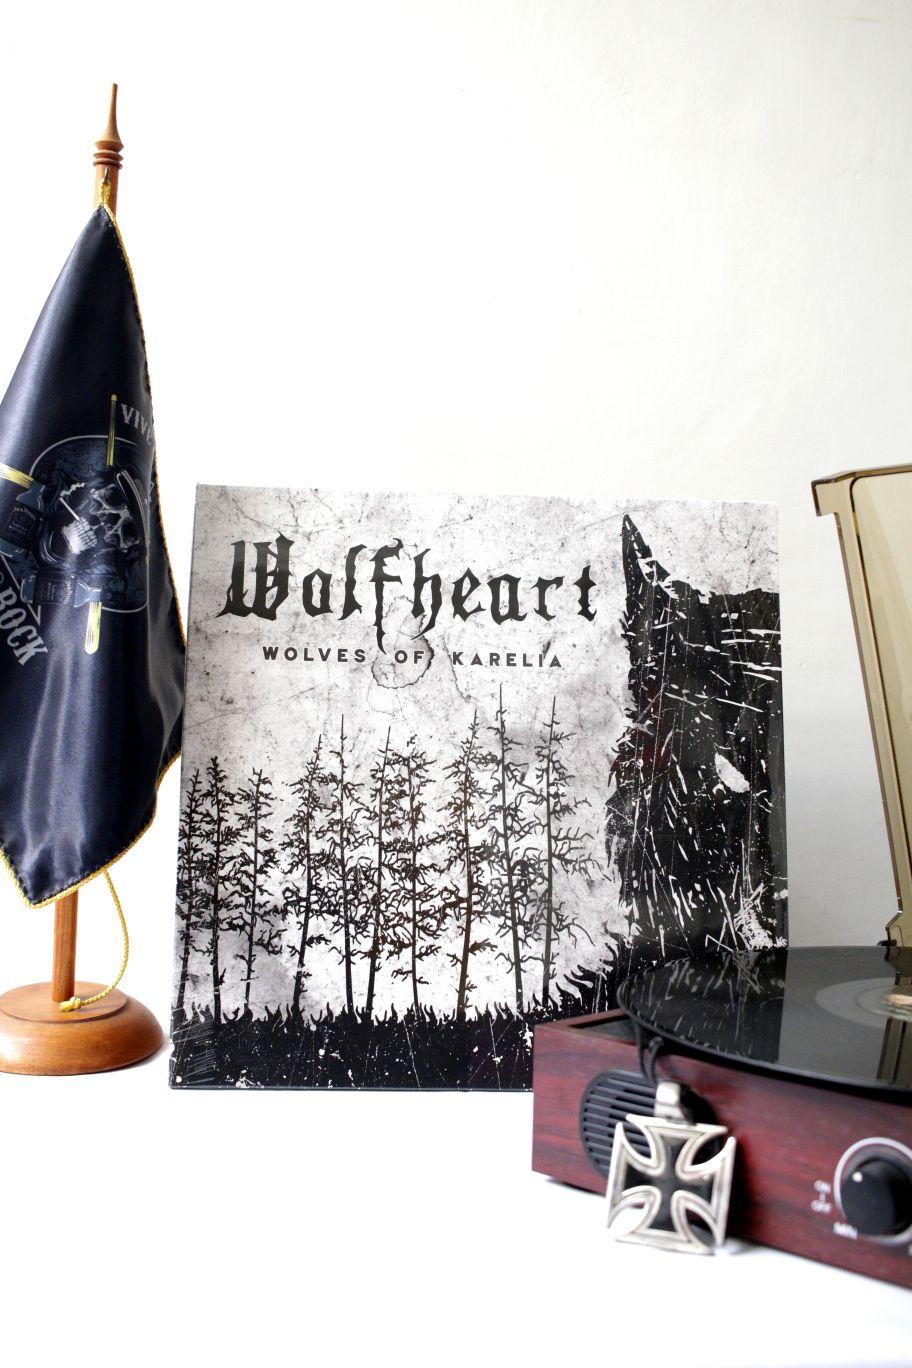 VINILO WOLFHEART WOLVES OF KARELIA